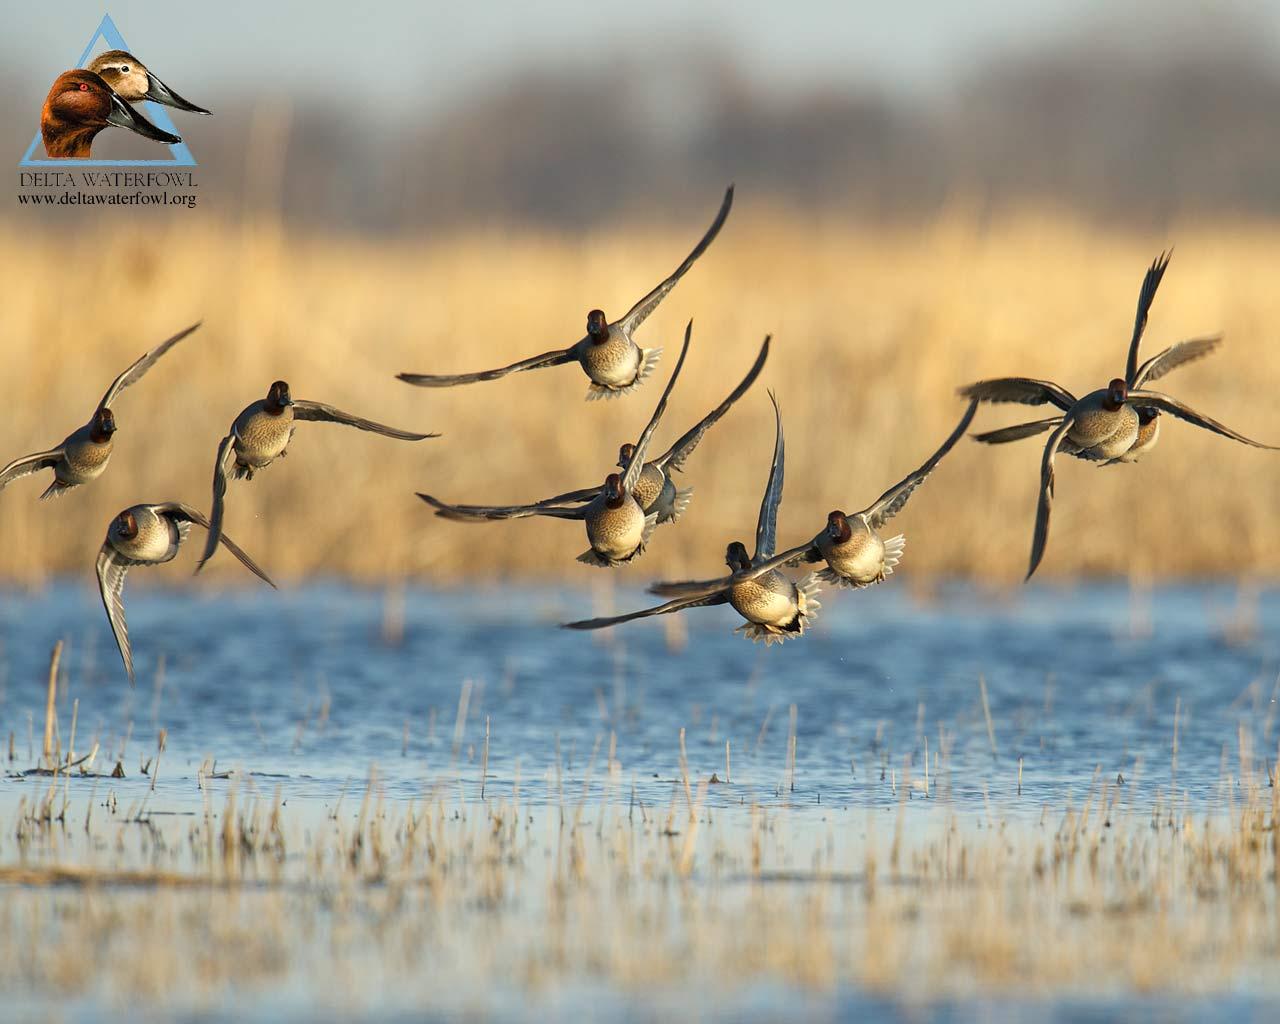 Bow Hunting Wallpaper - Duck Hunting Wallpaper Hd - HD Wallpaper